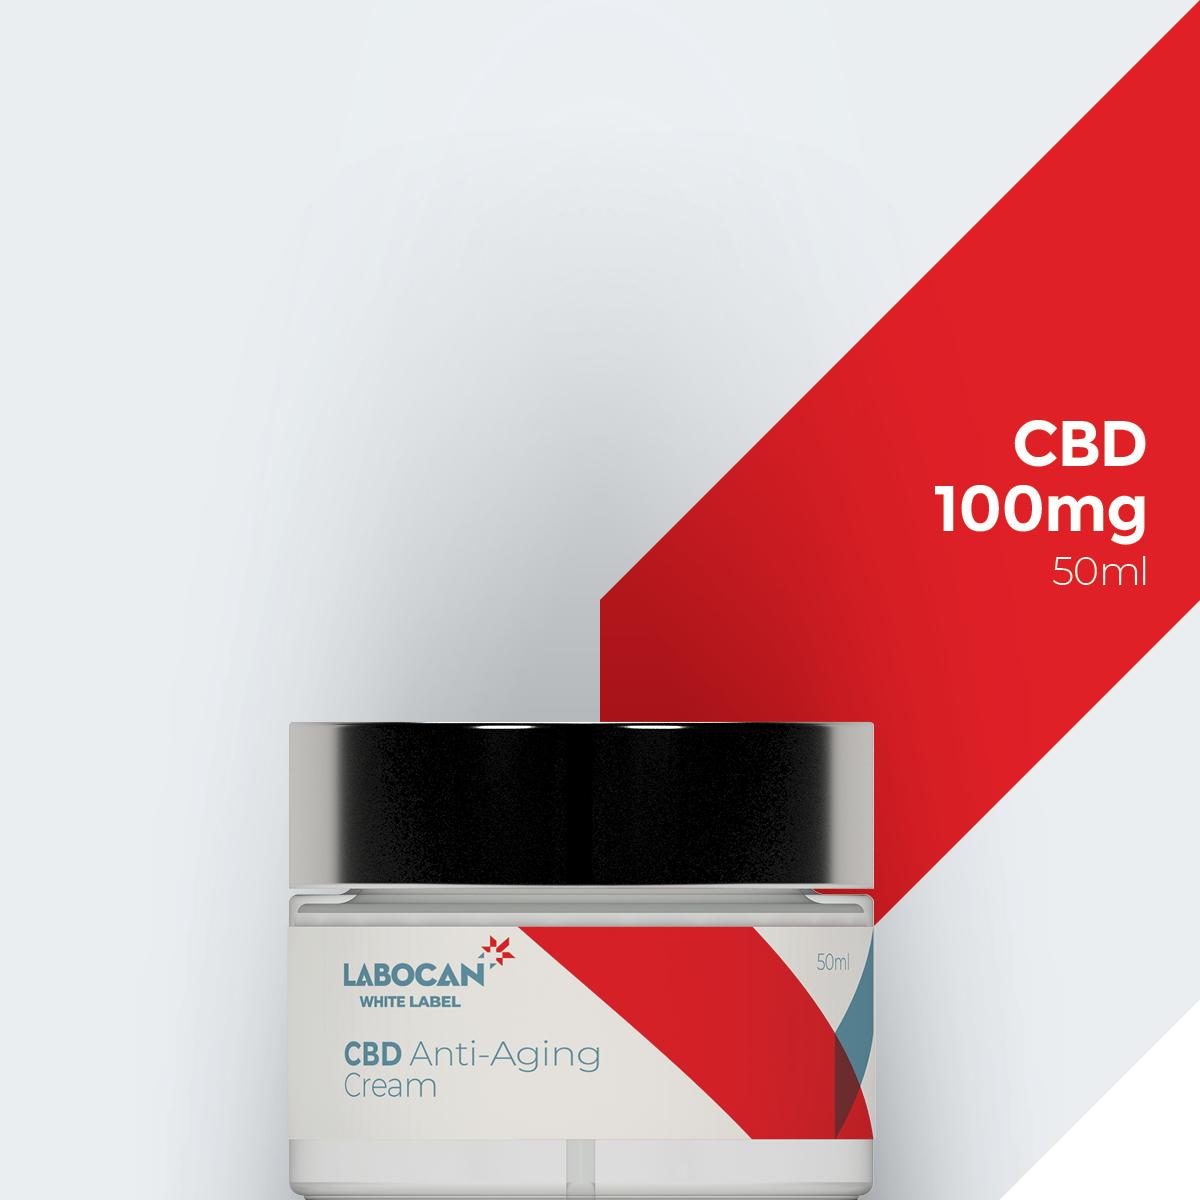 White Label CBD Kosmetik